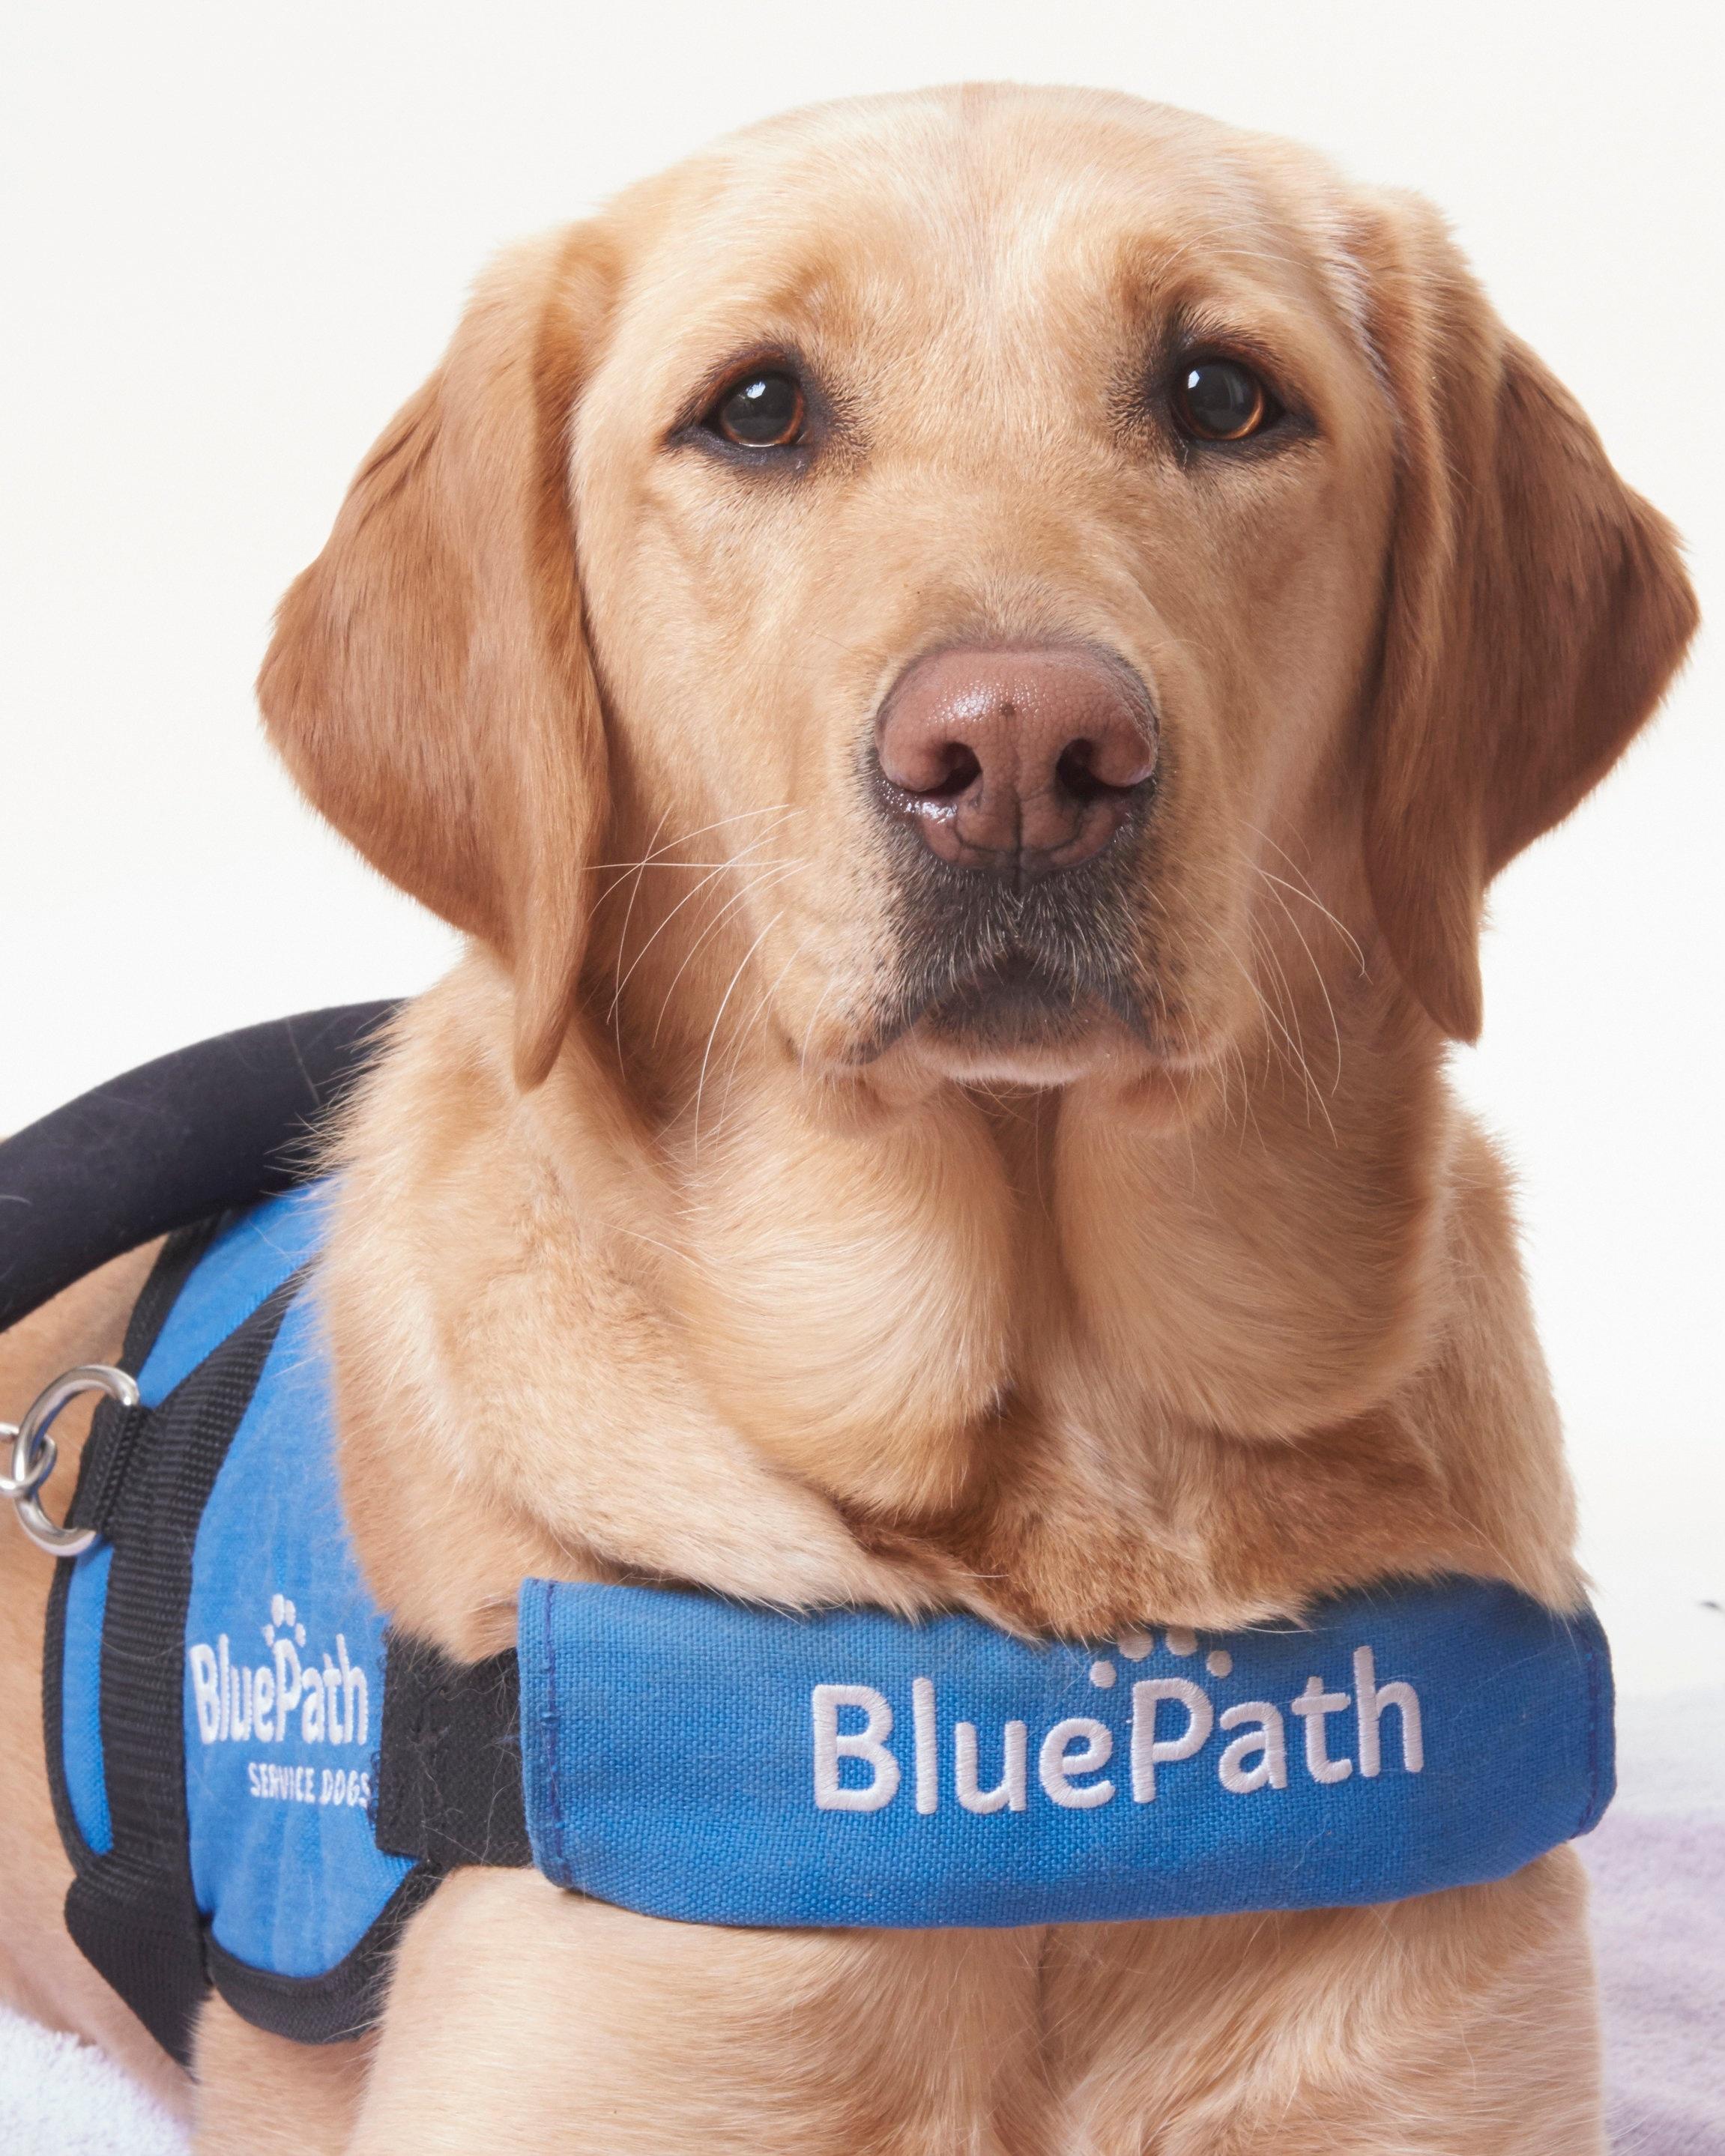 BluePath service dog, Autumn